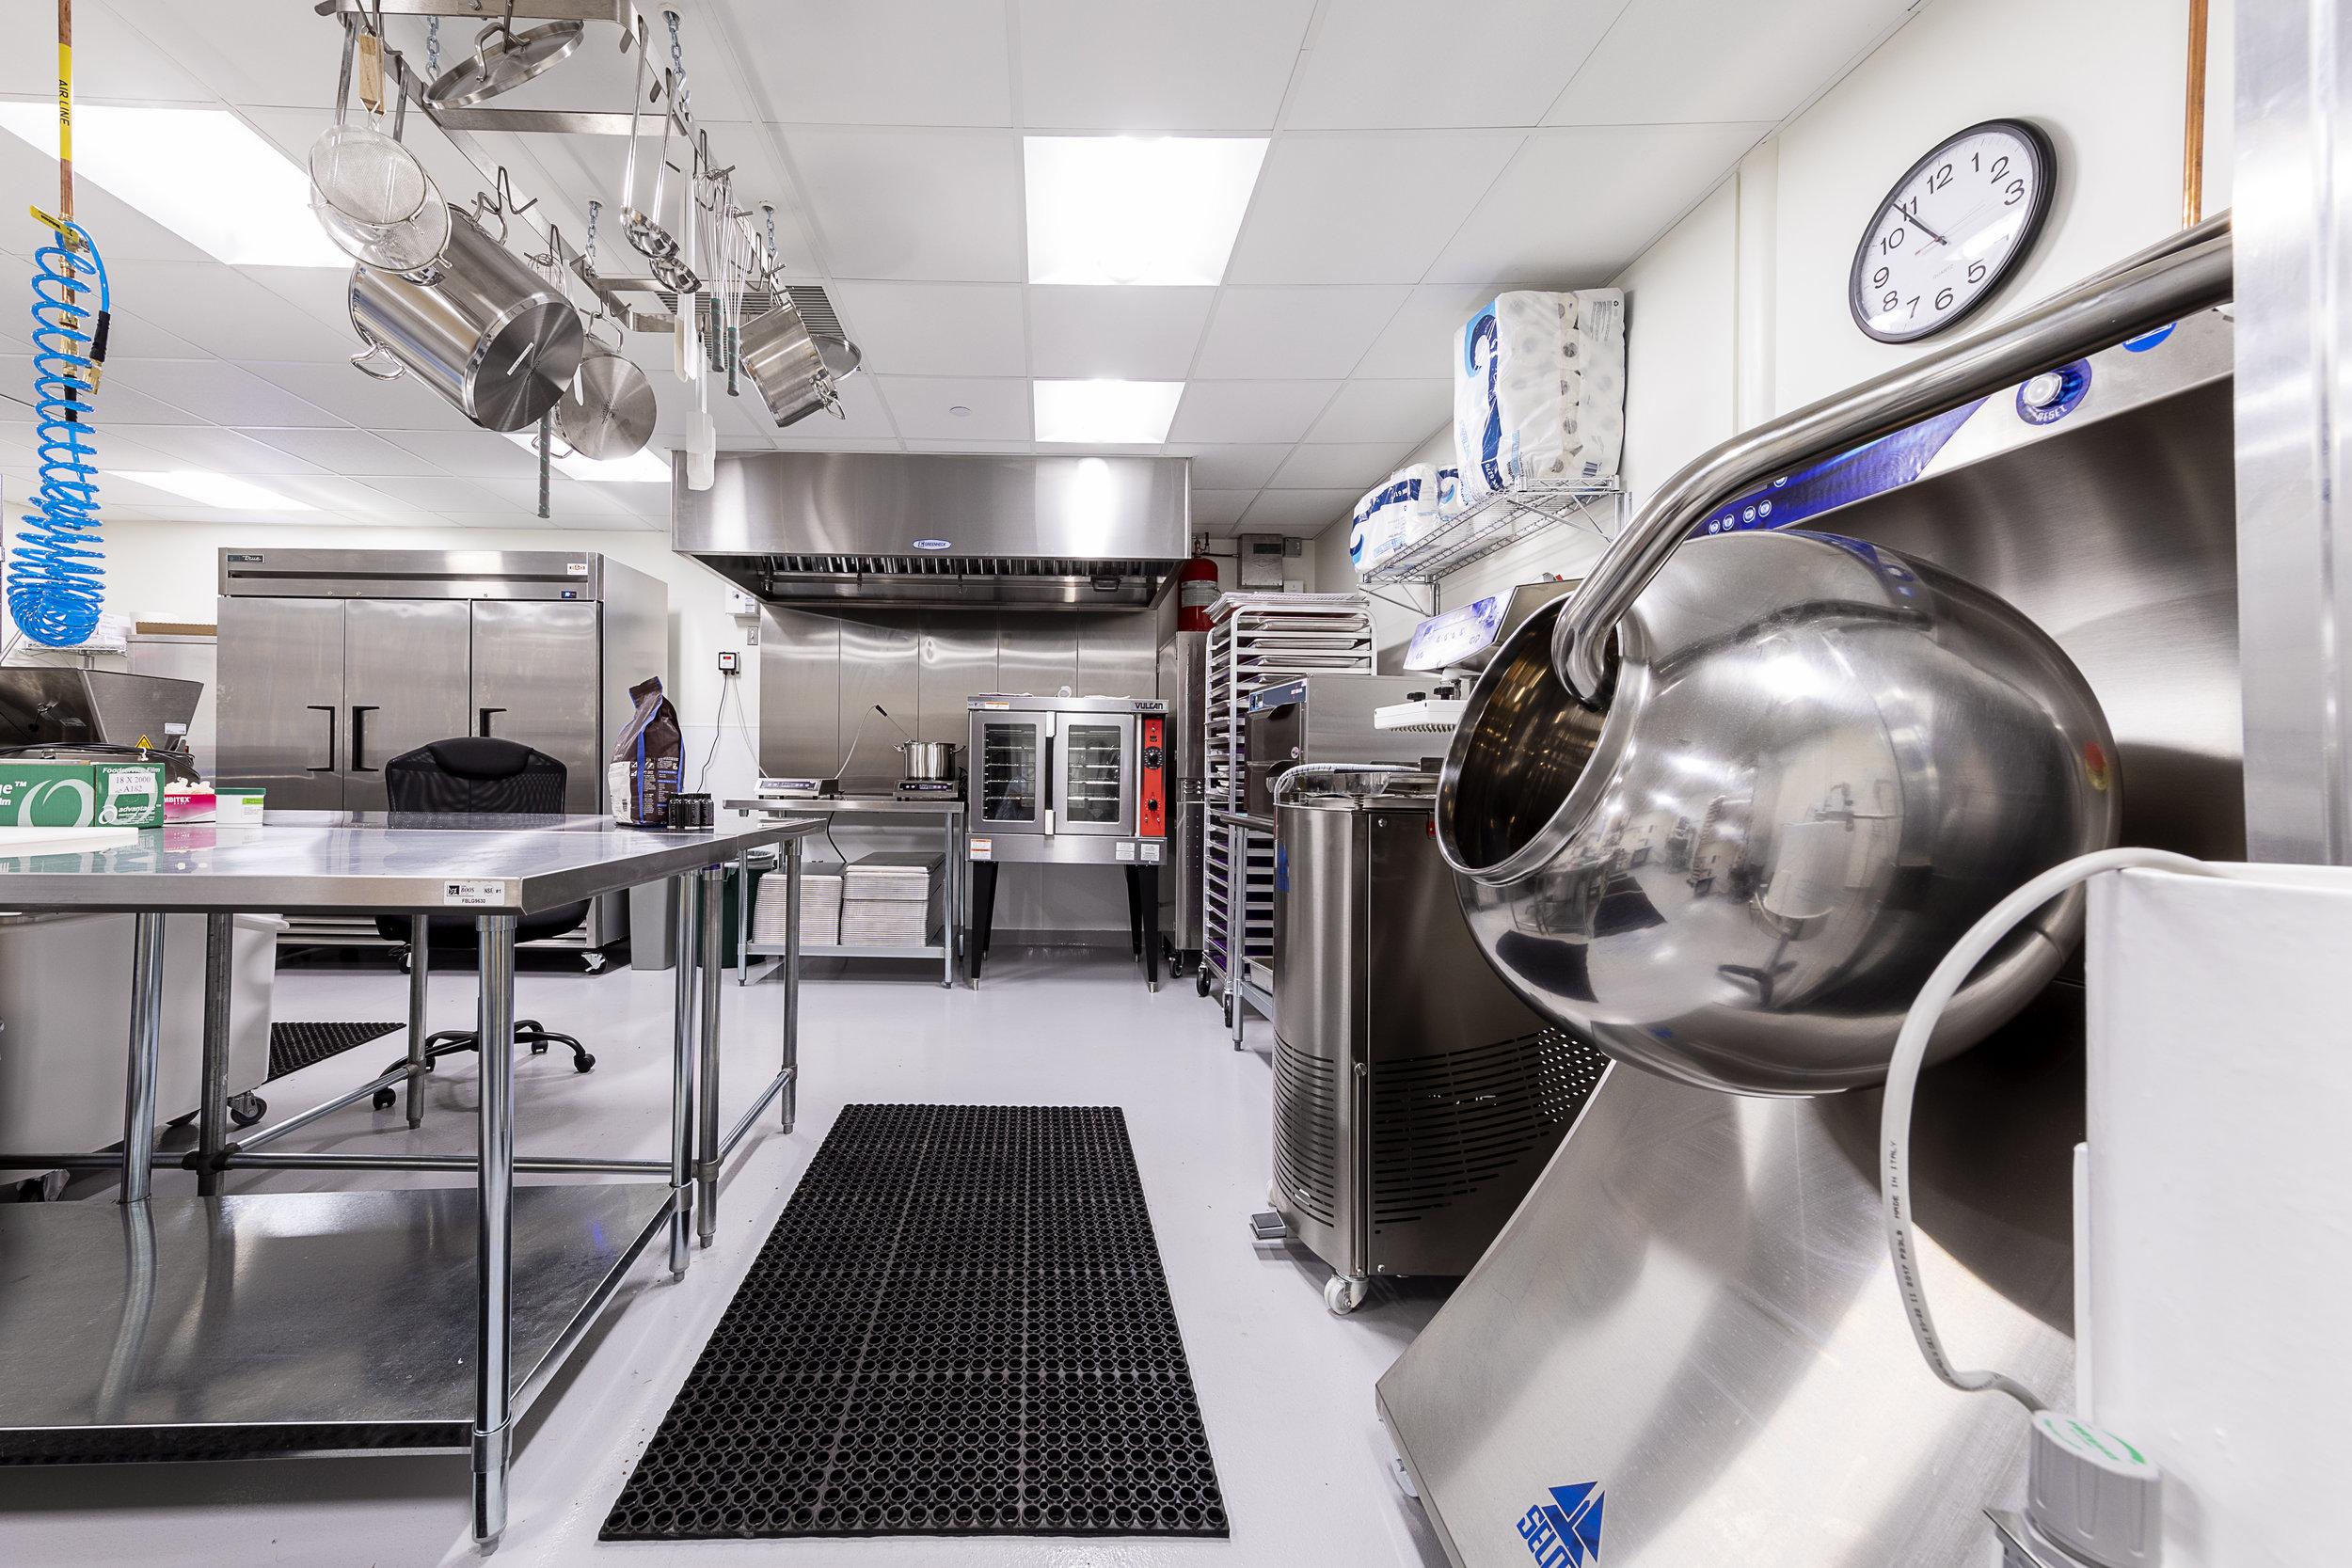 CONSUMER GOODS / CHROMA Edibles Production Facility (Taunton, MA)